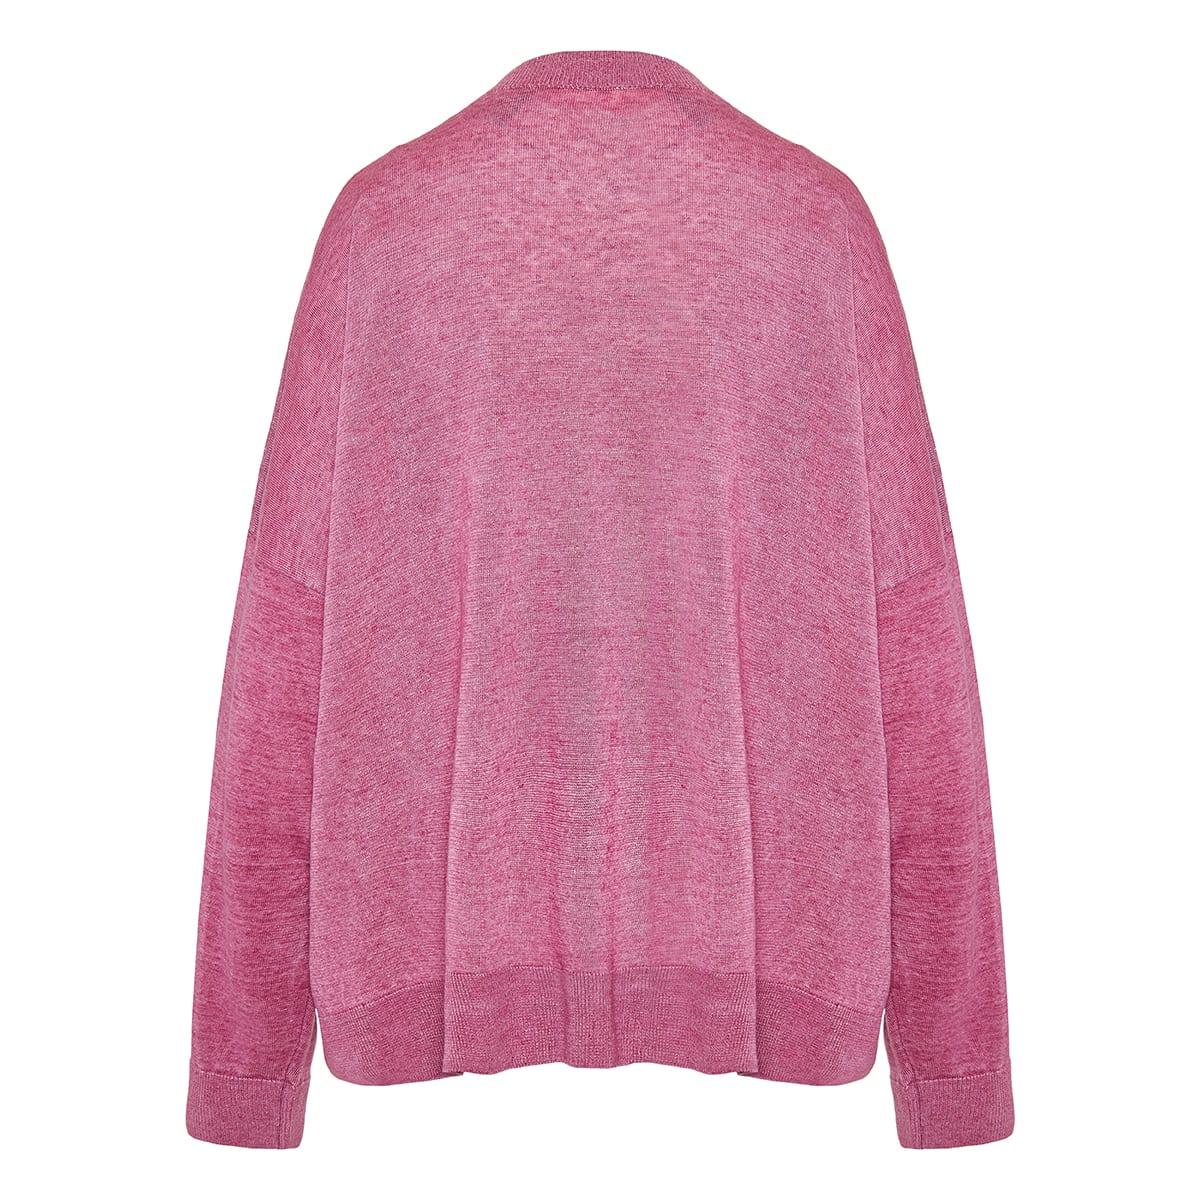 Logo jacquard linen sweater